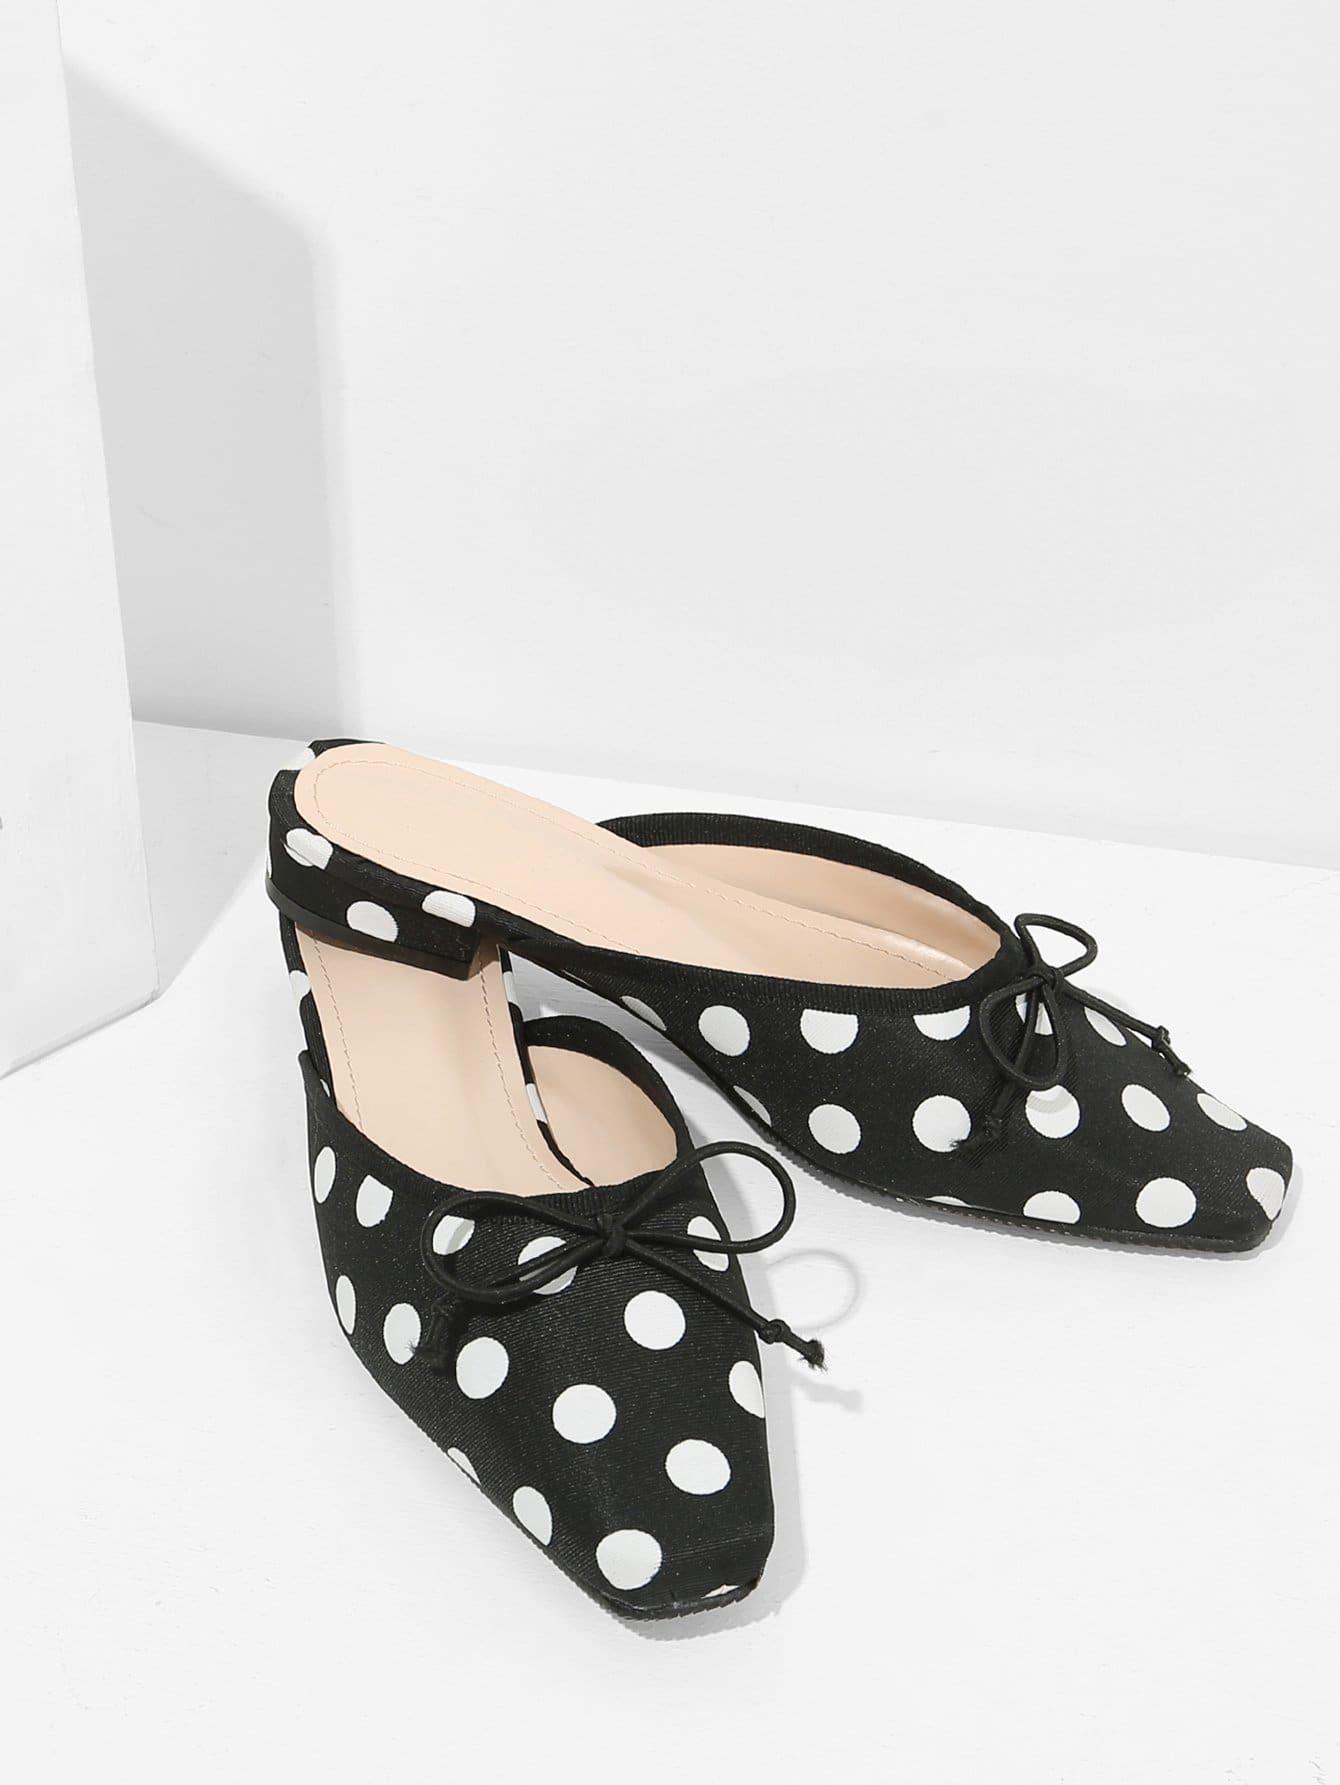 Polka Dot Bow-knot Square Toe Flats polka dot square coaster